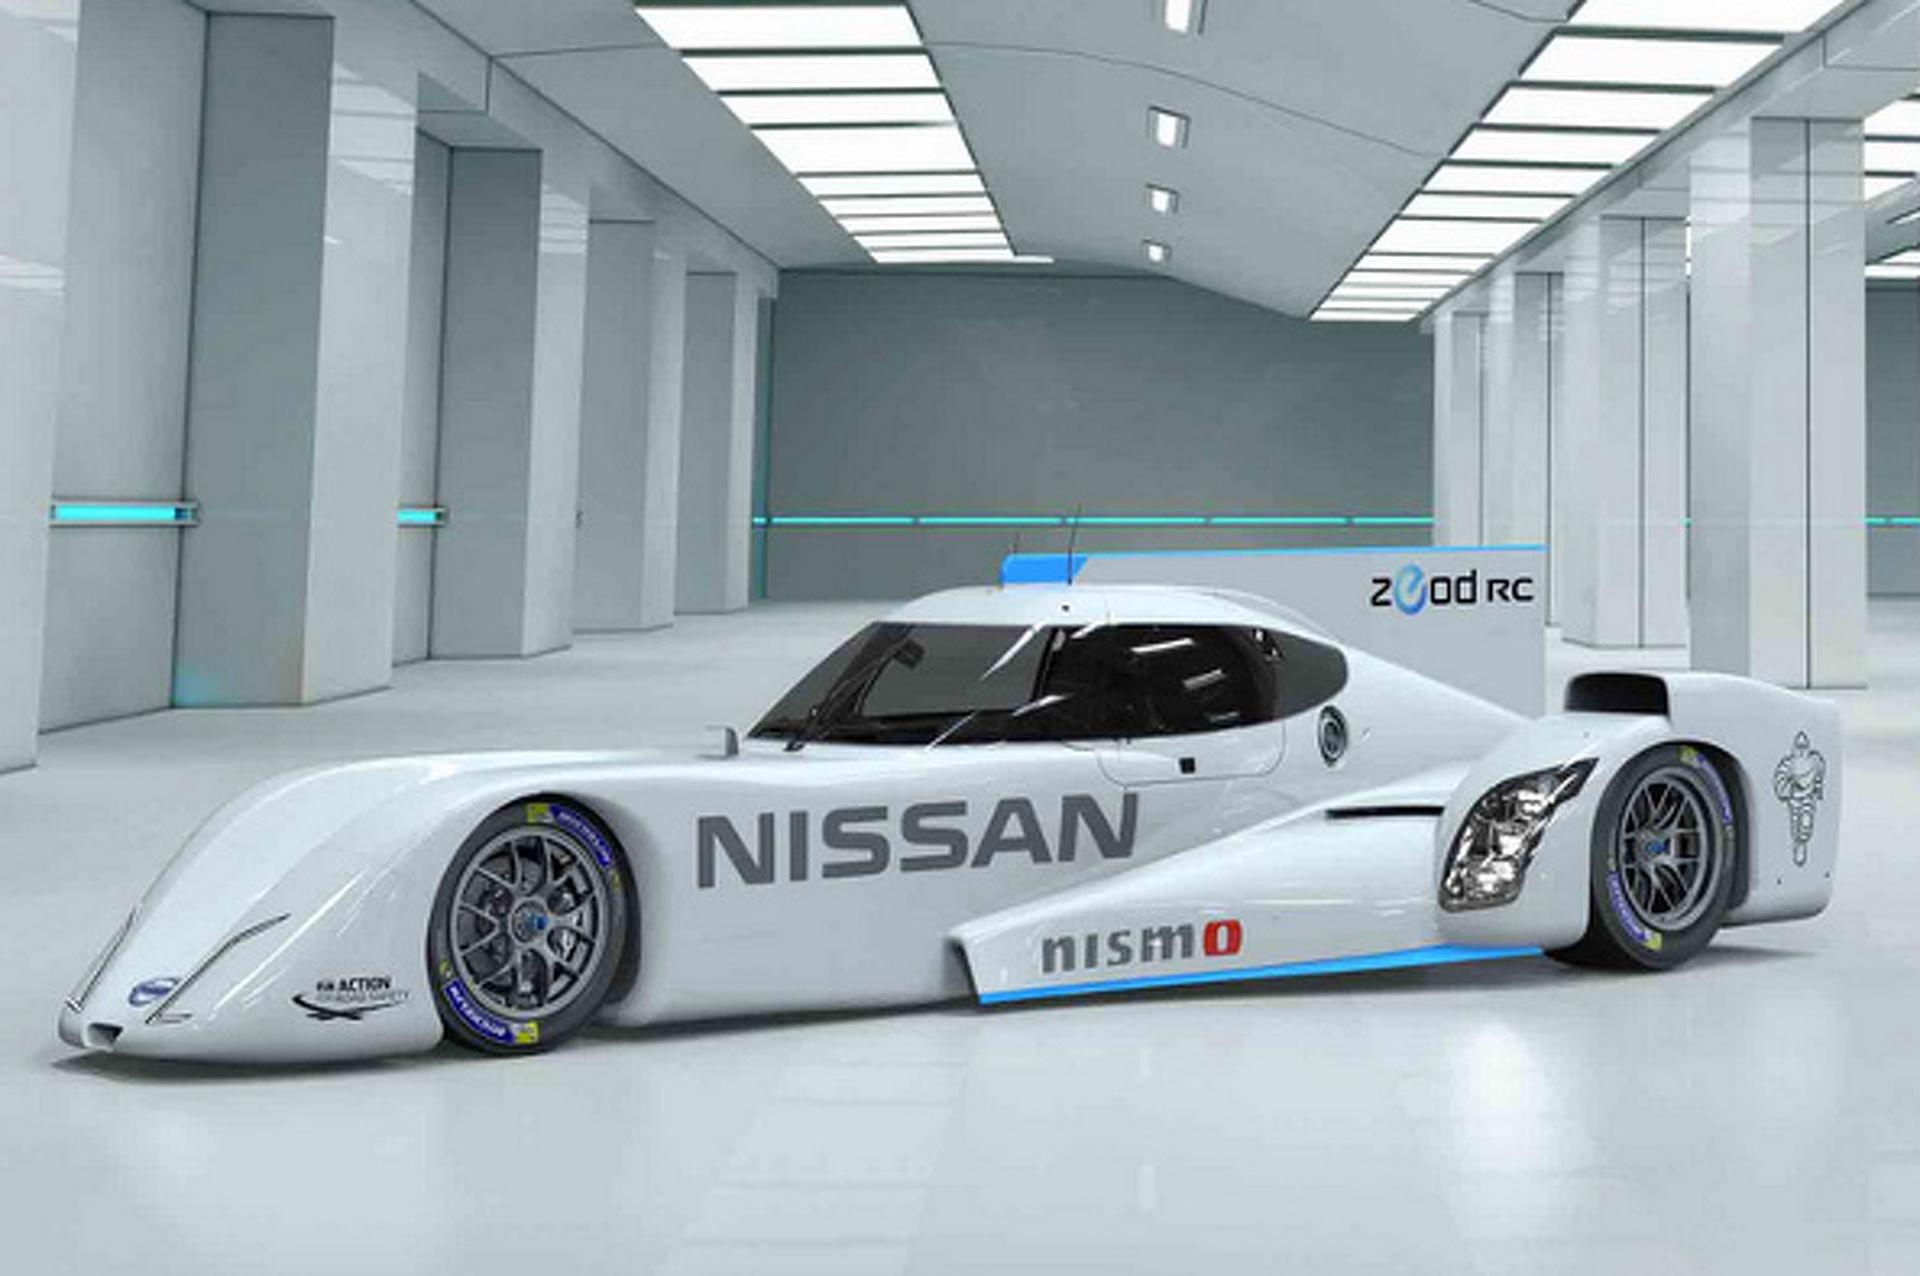 Nissan ZEOD RC Portends Future of Fuel-Efficient Racing?